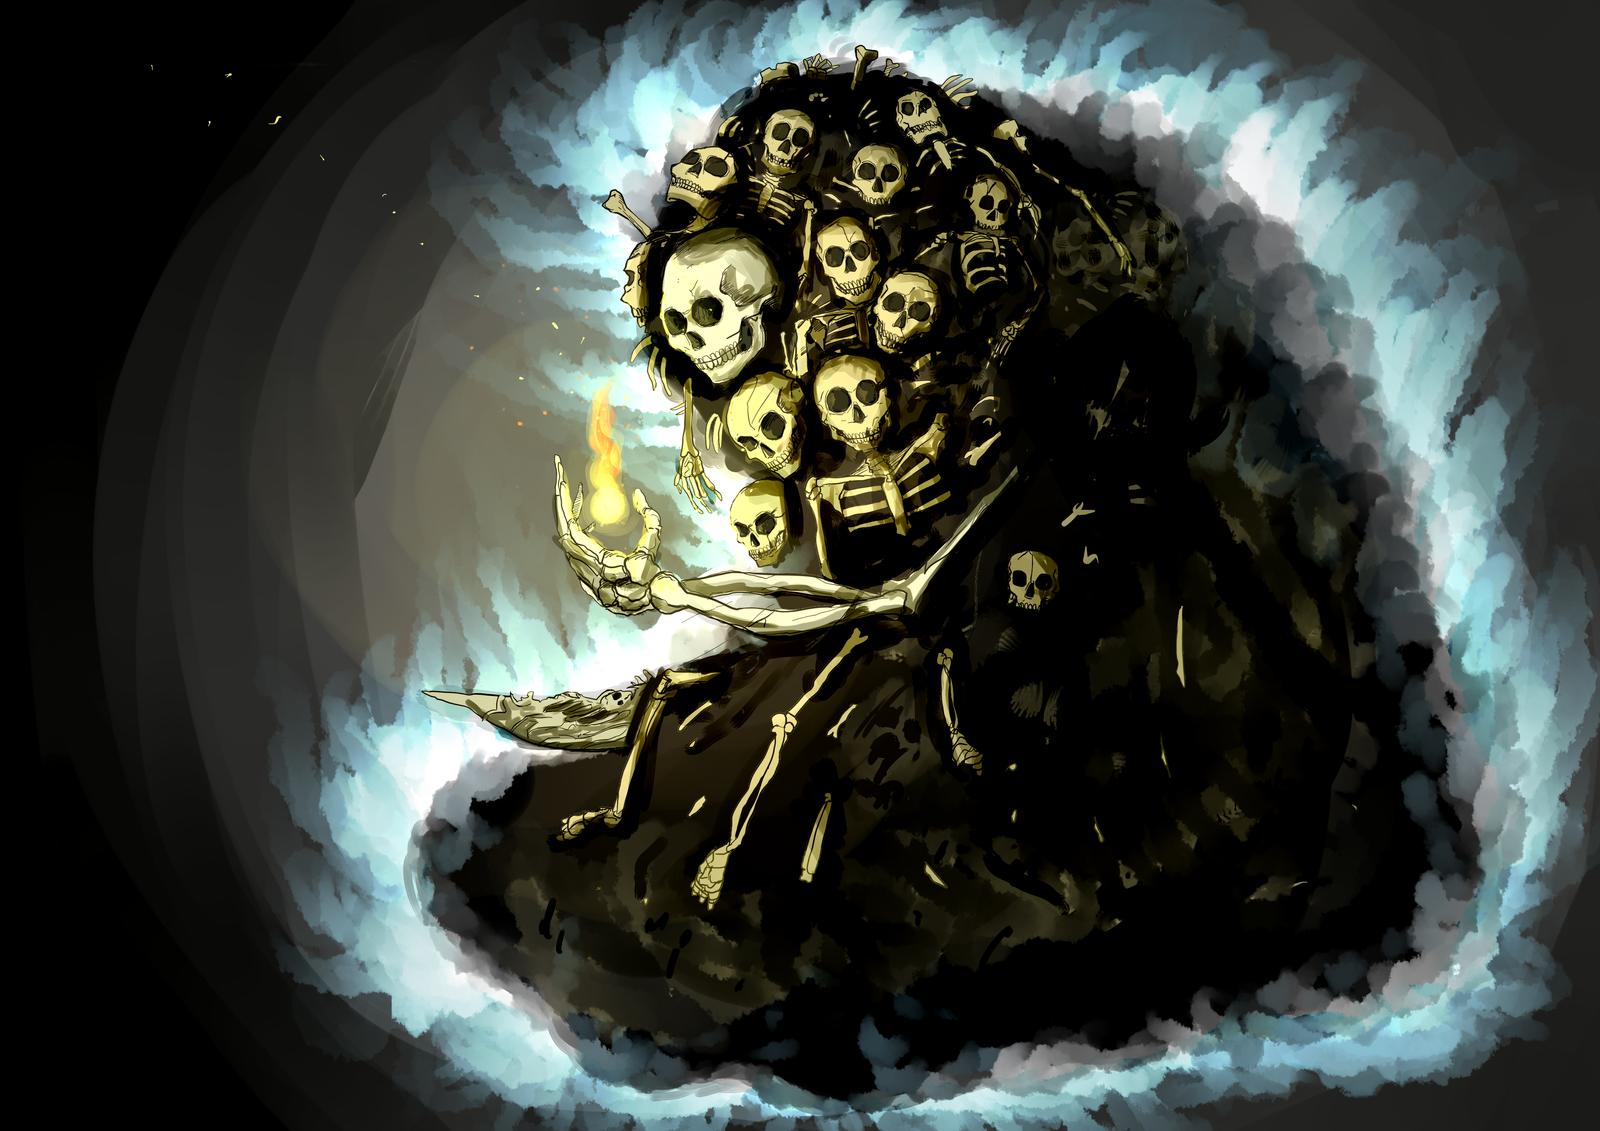 dark souls nito artwork - photo #7